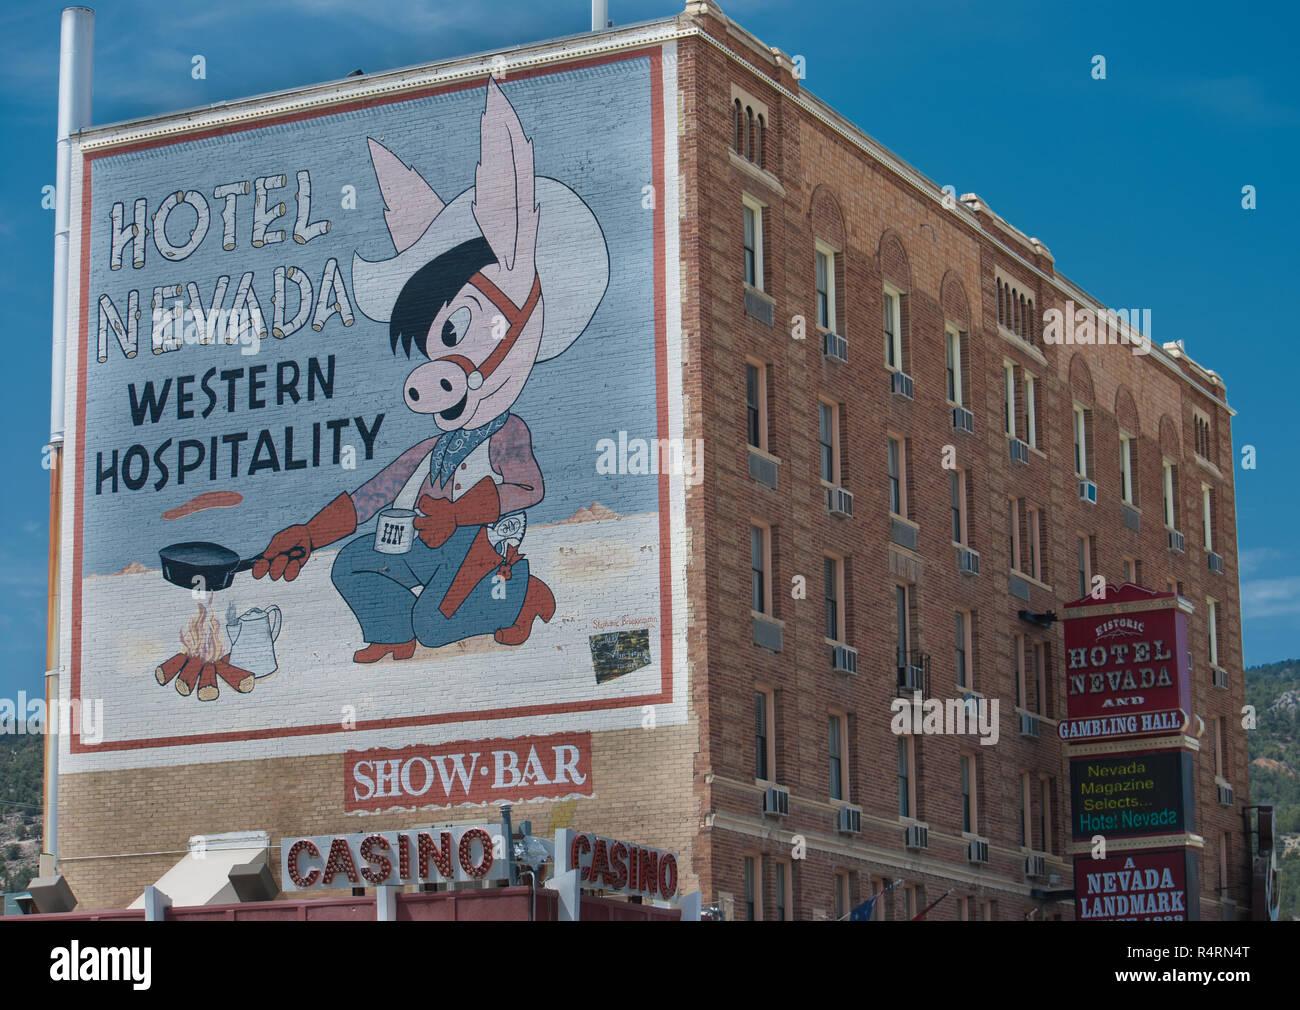 Hotel Nevada Mural - Stock Image